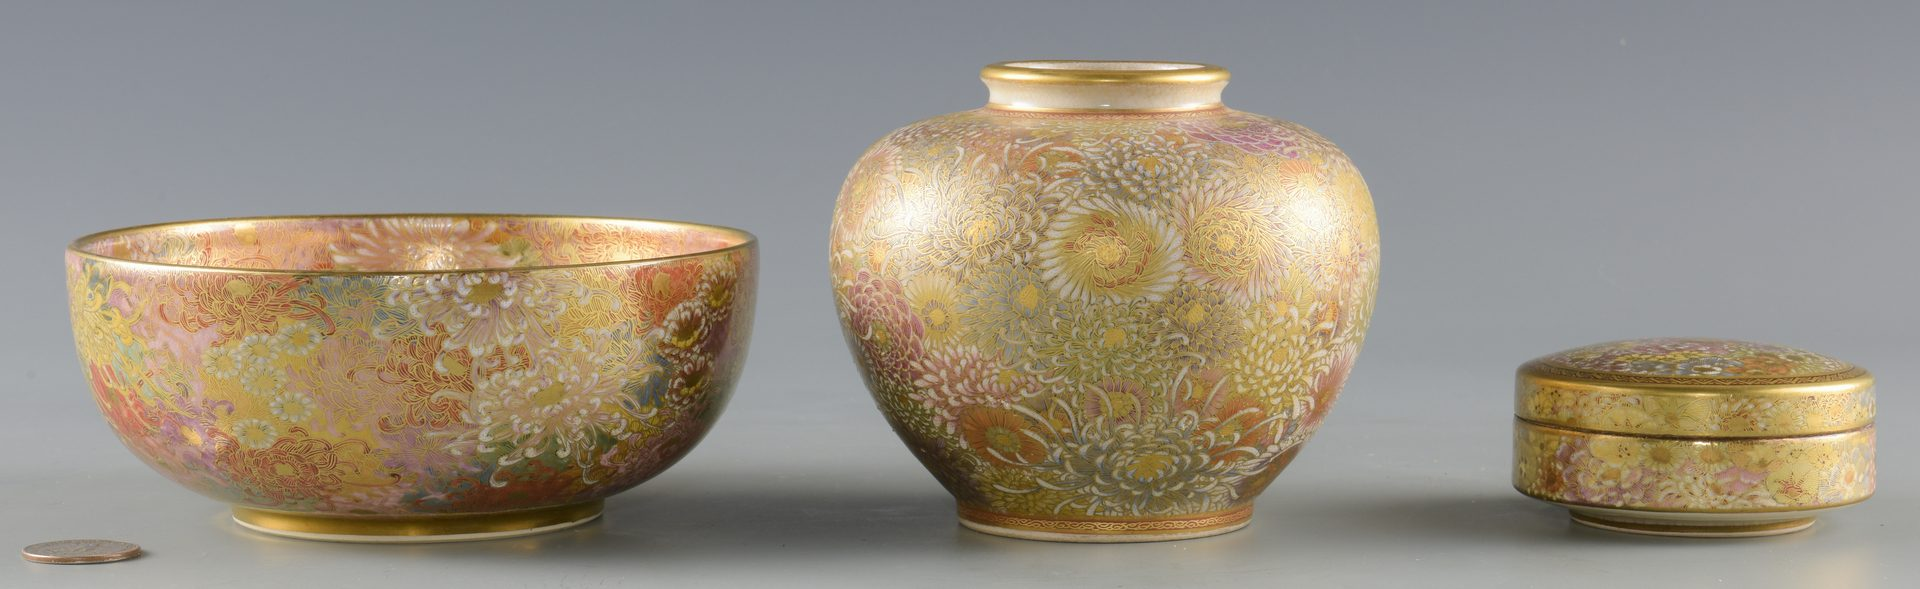 Lot 275: 3 Japanese Satsuma Porcelain Items